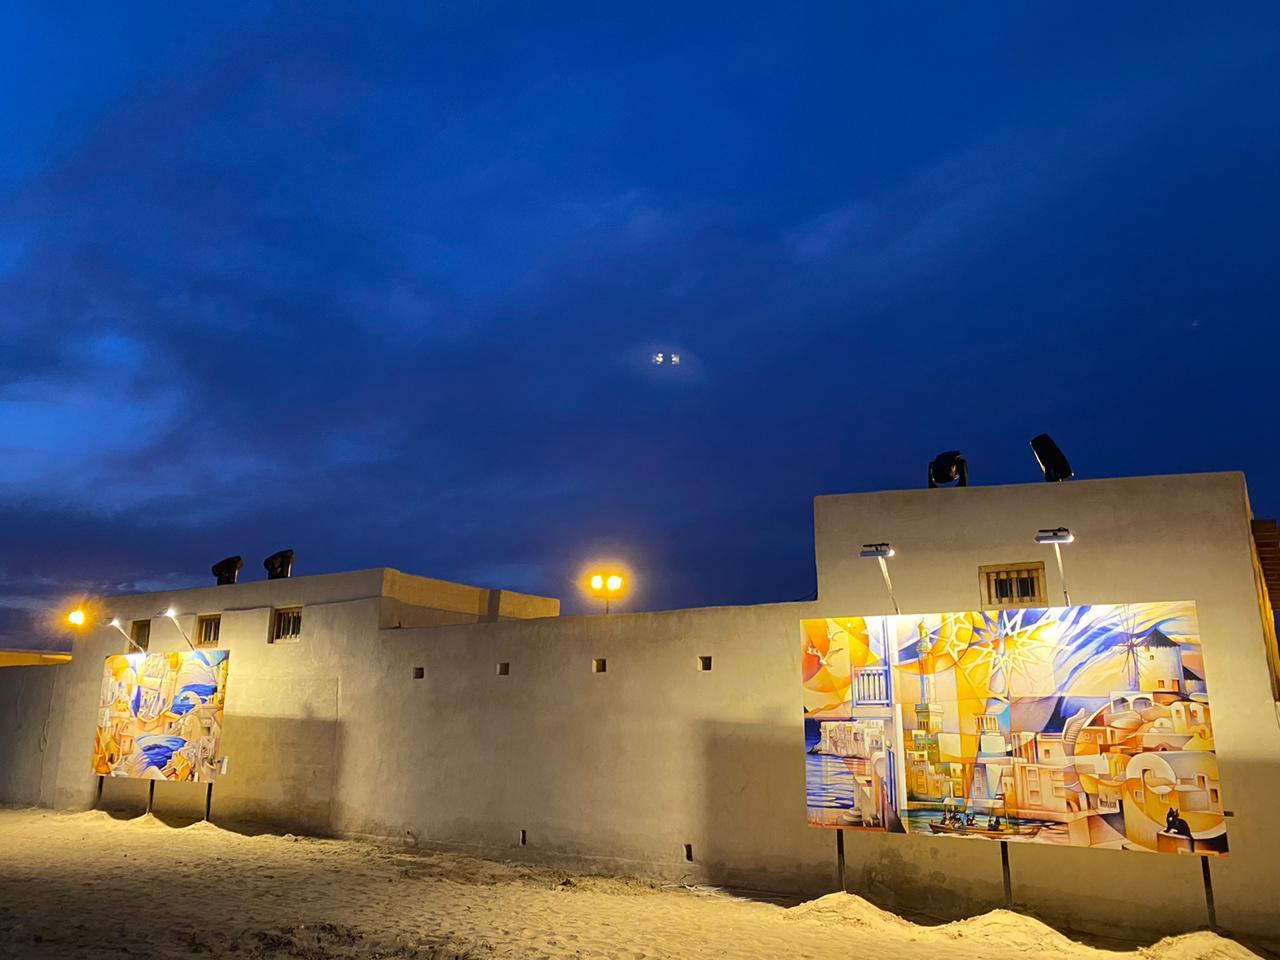 Ras al Khaimah fine arts